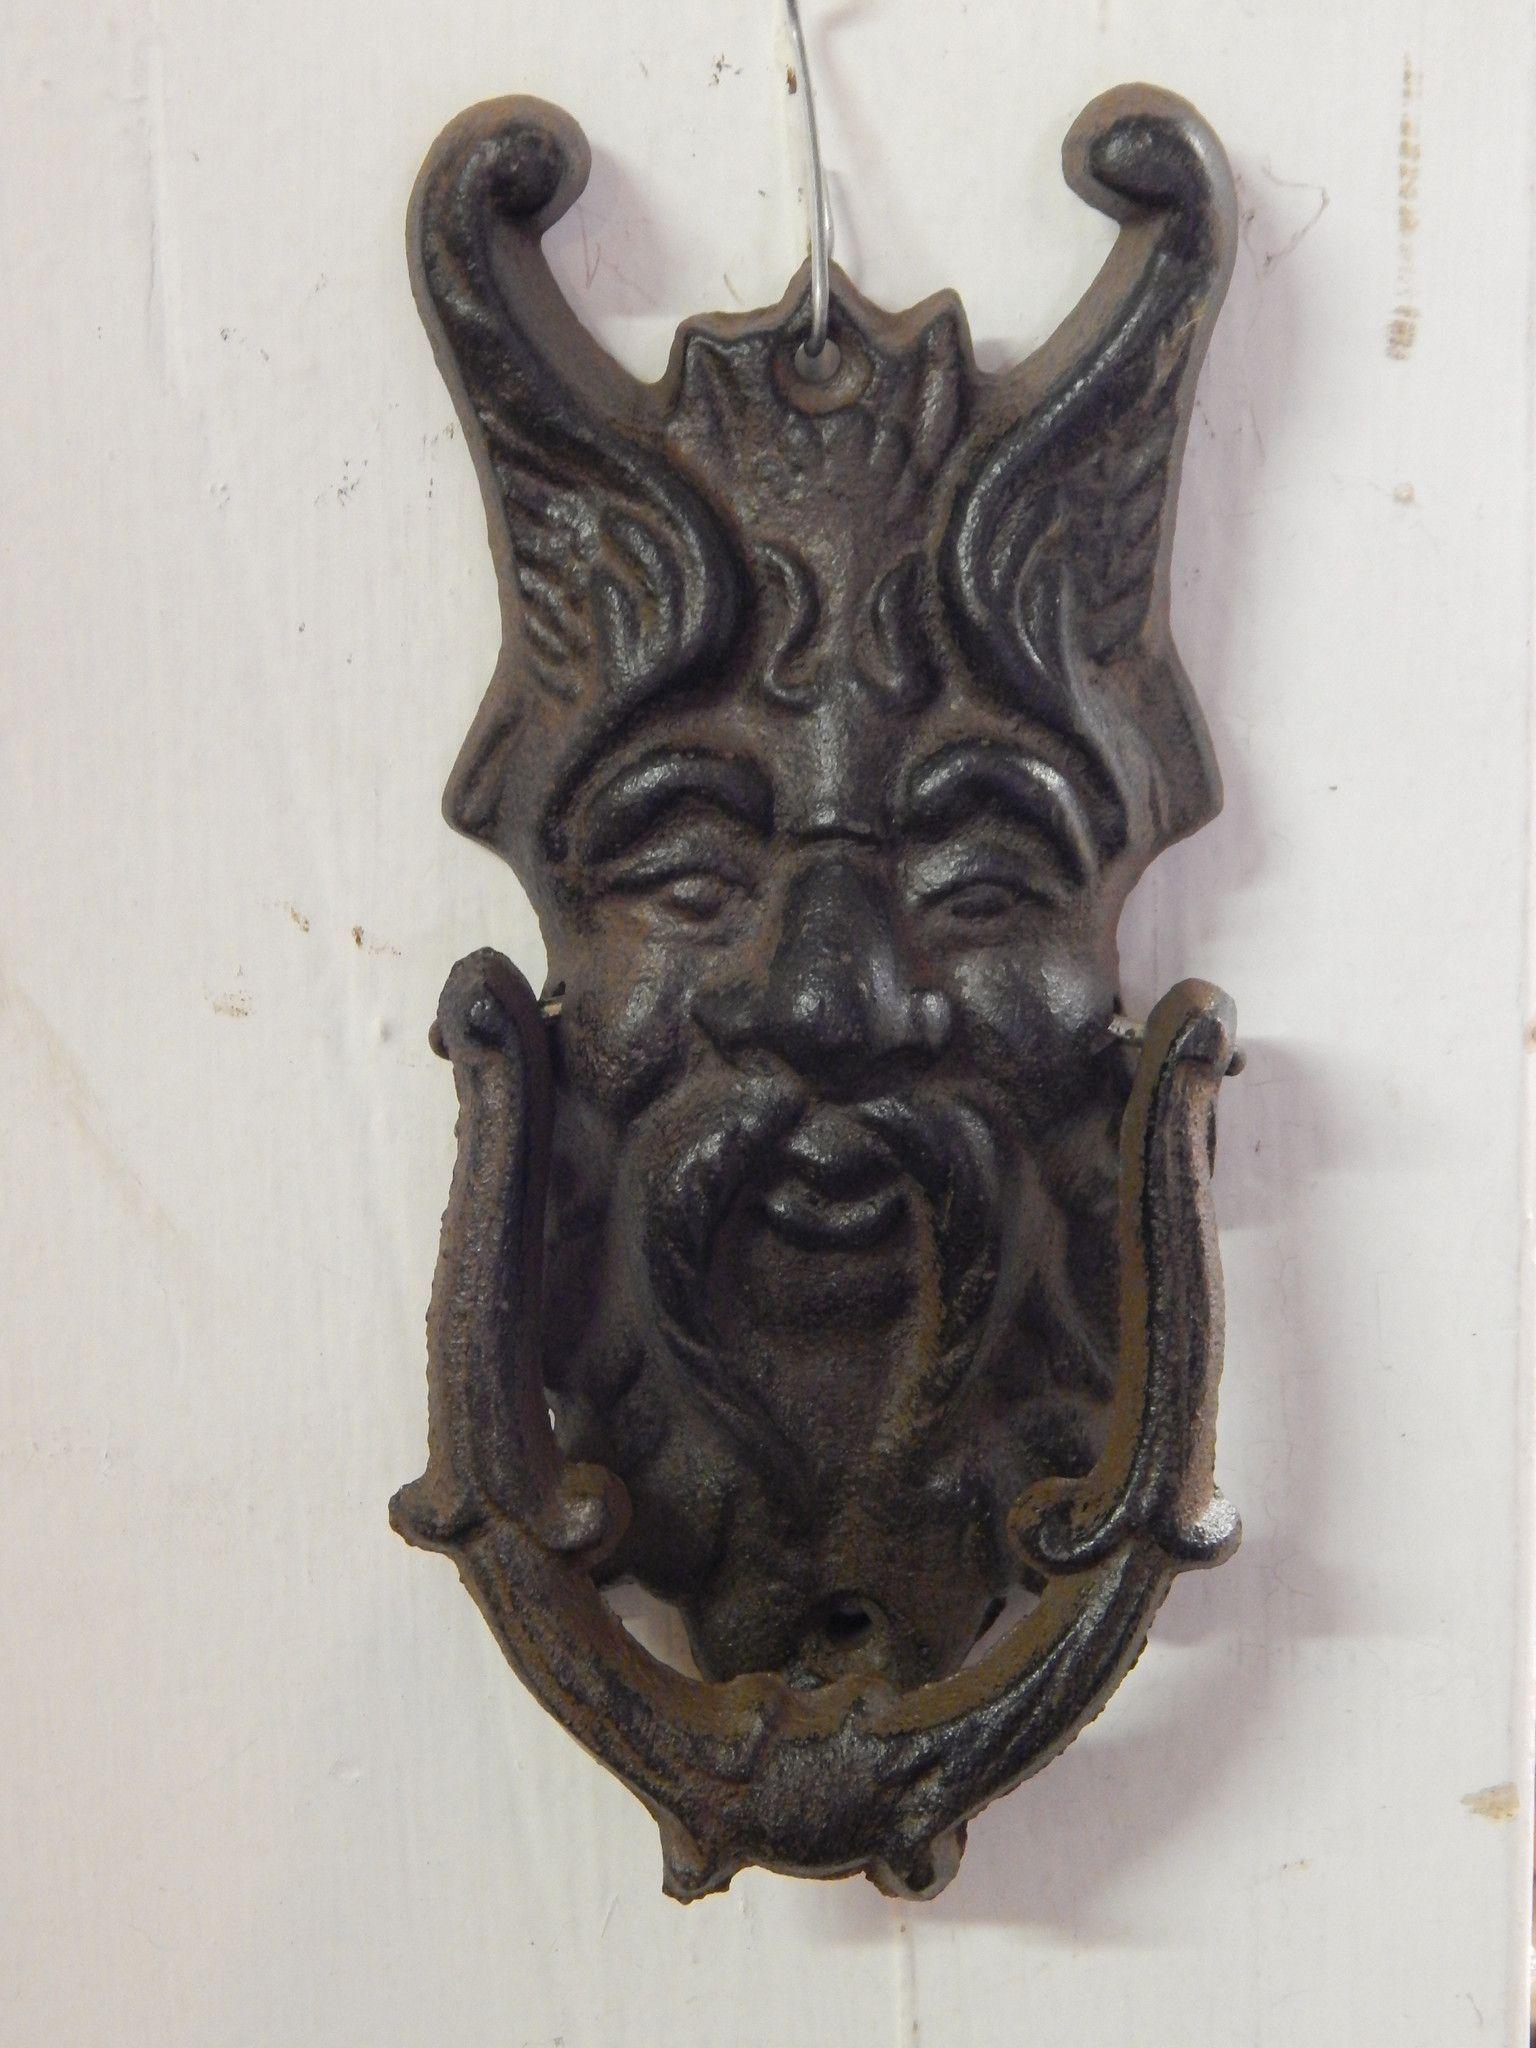 Cast Iron Door Knocker - Gothic Face Gargoyle Griffin & Cast Iron Door Knocker - Gothic Face Gargoyle Griffin | Gothic and ... pezcame.com